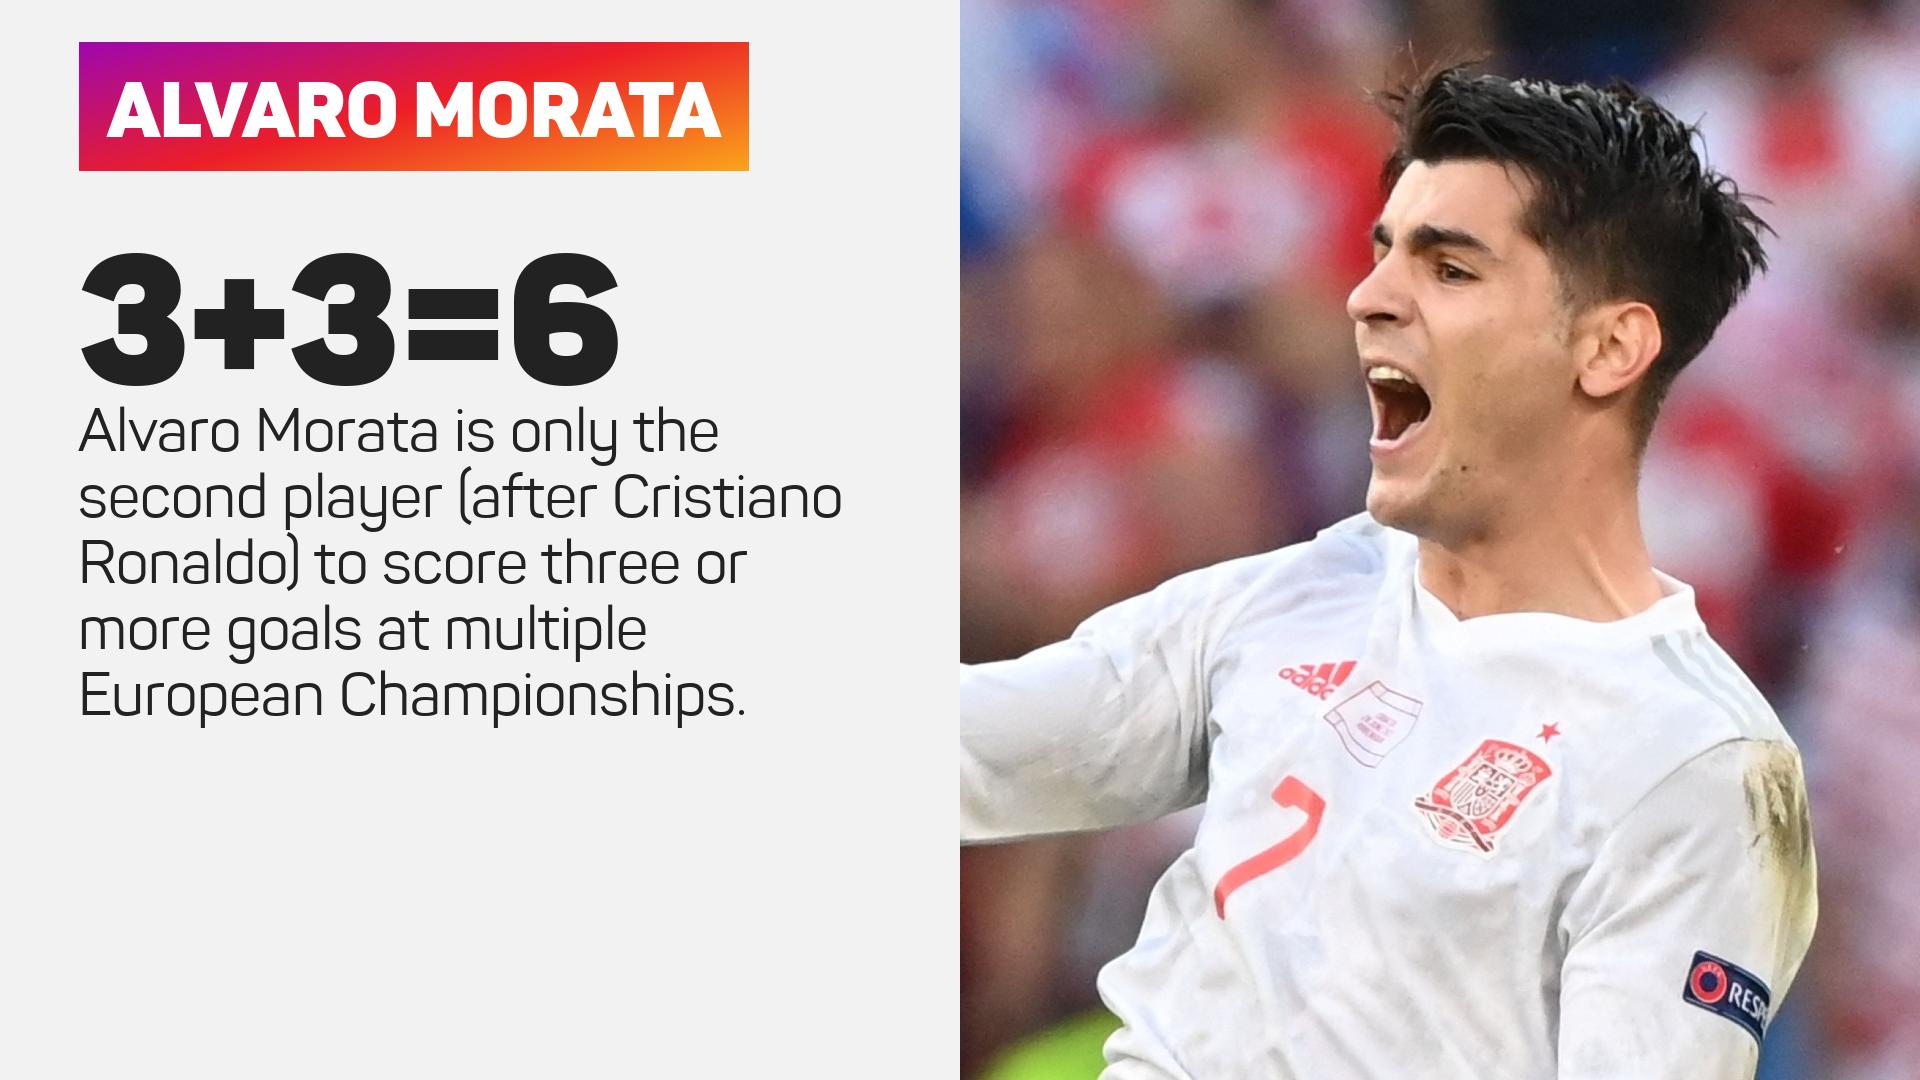 Alvaro Morata at the European Championships